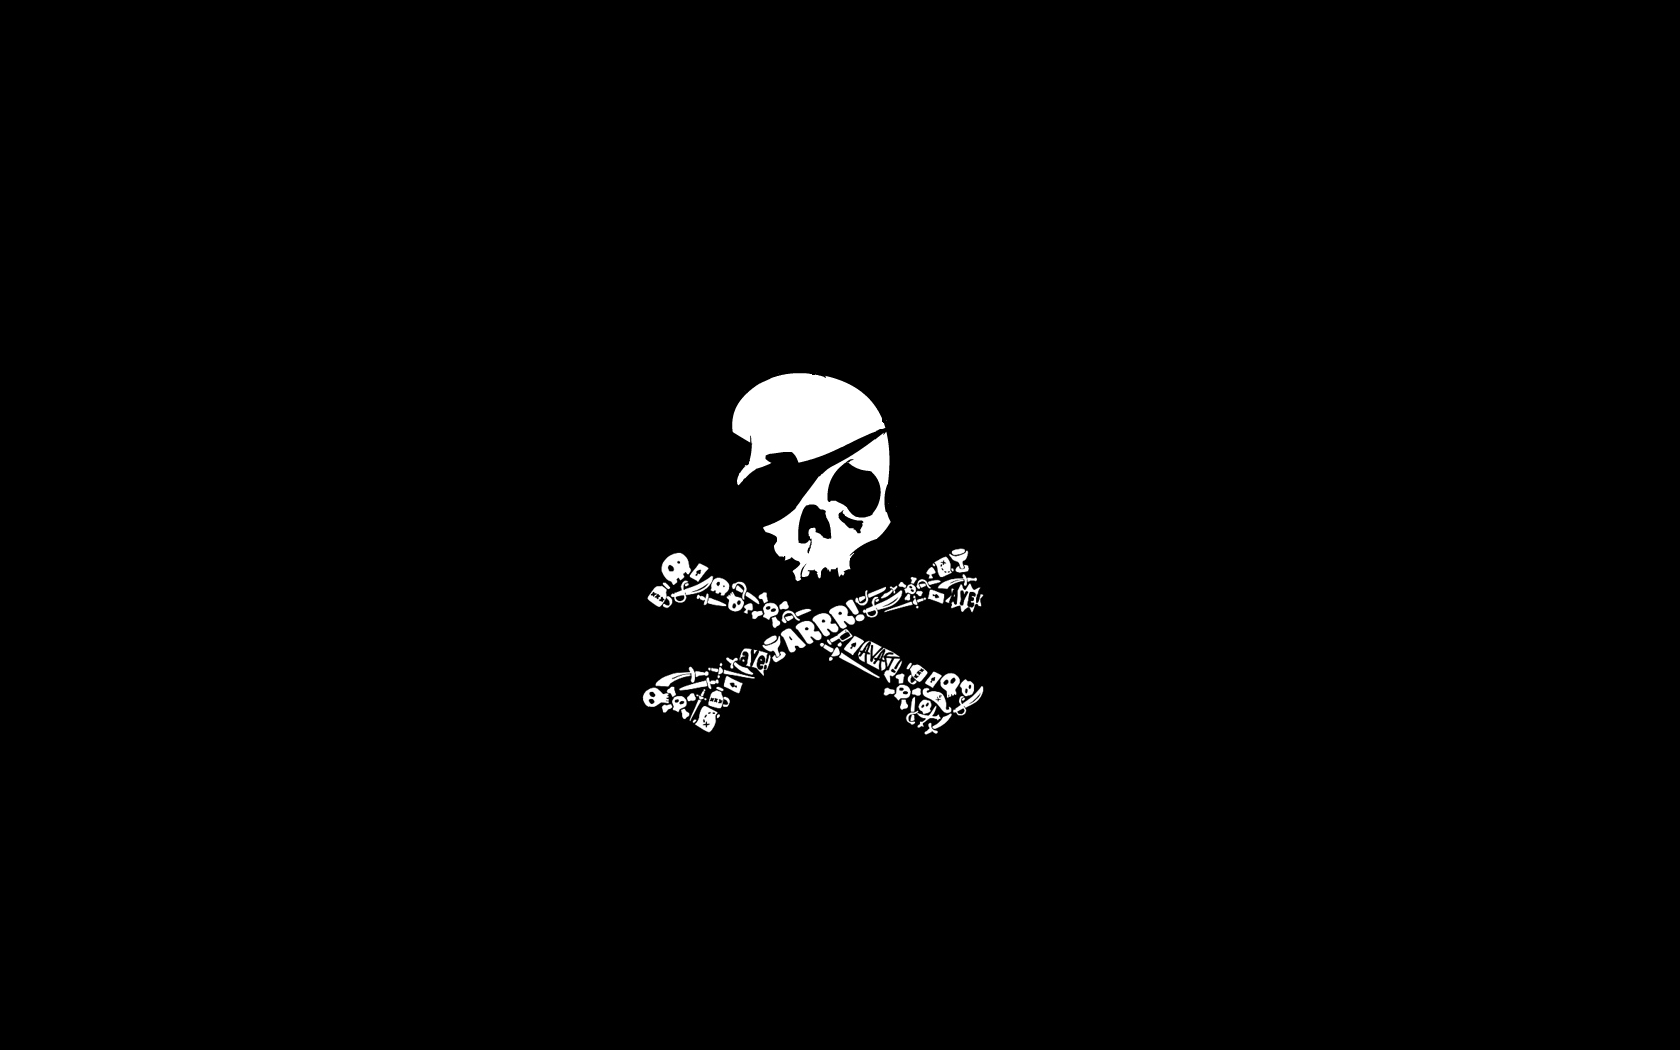 Pirate Skull Wallpapers Wallpaper Cave